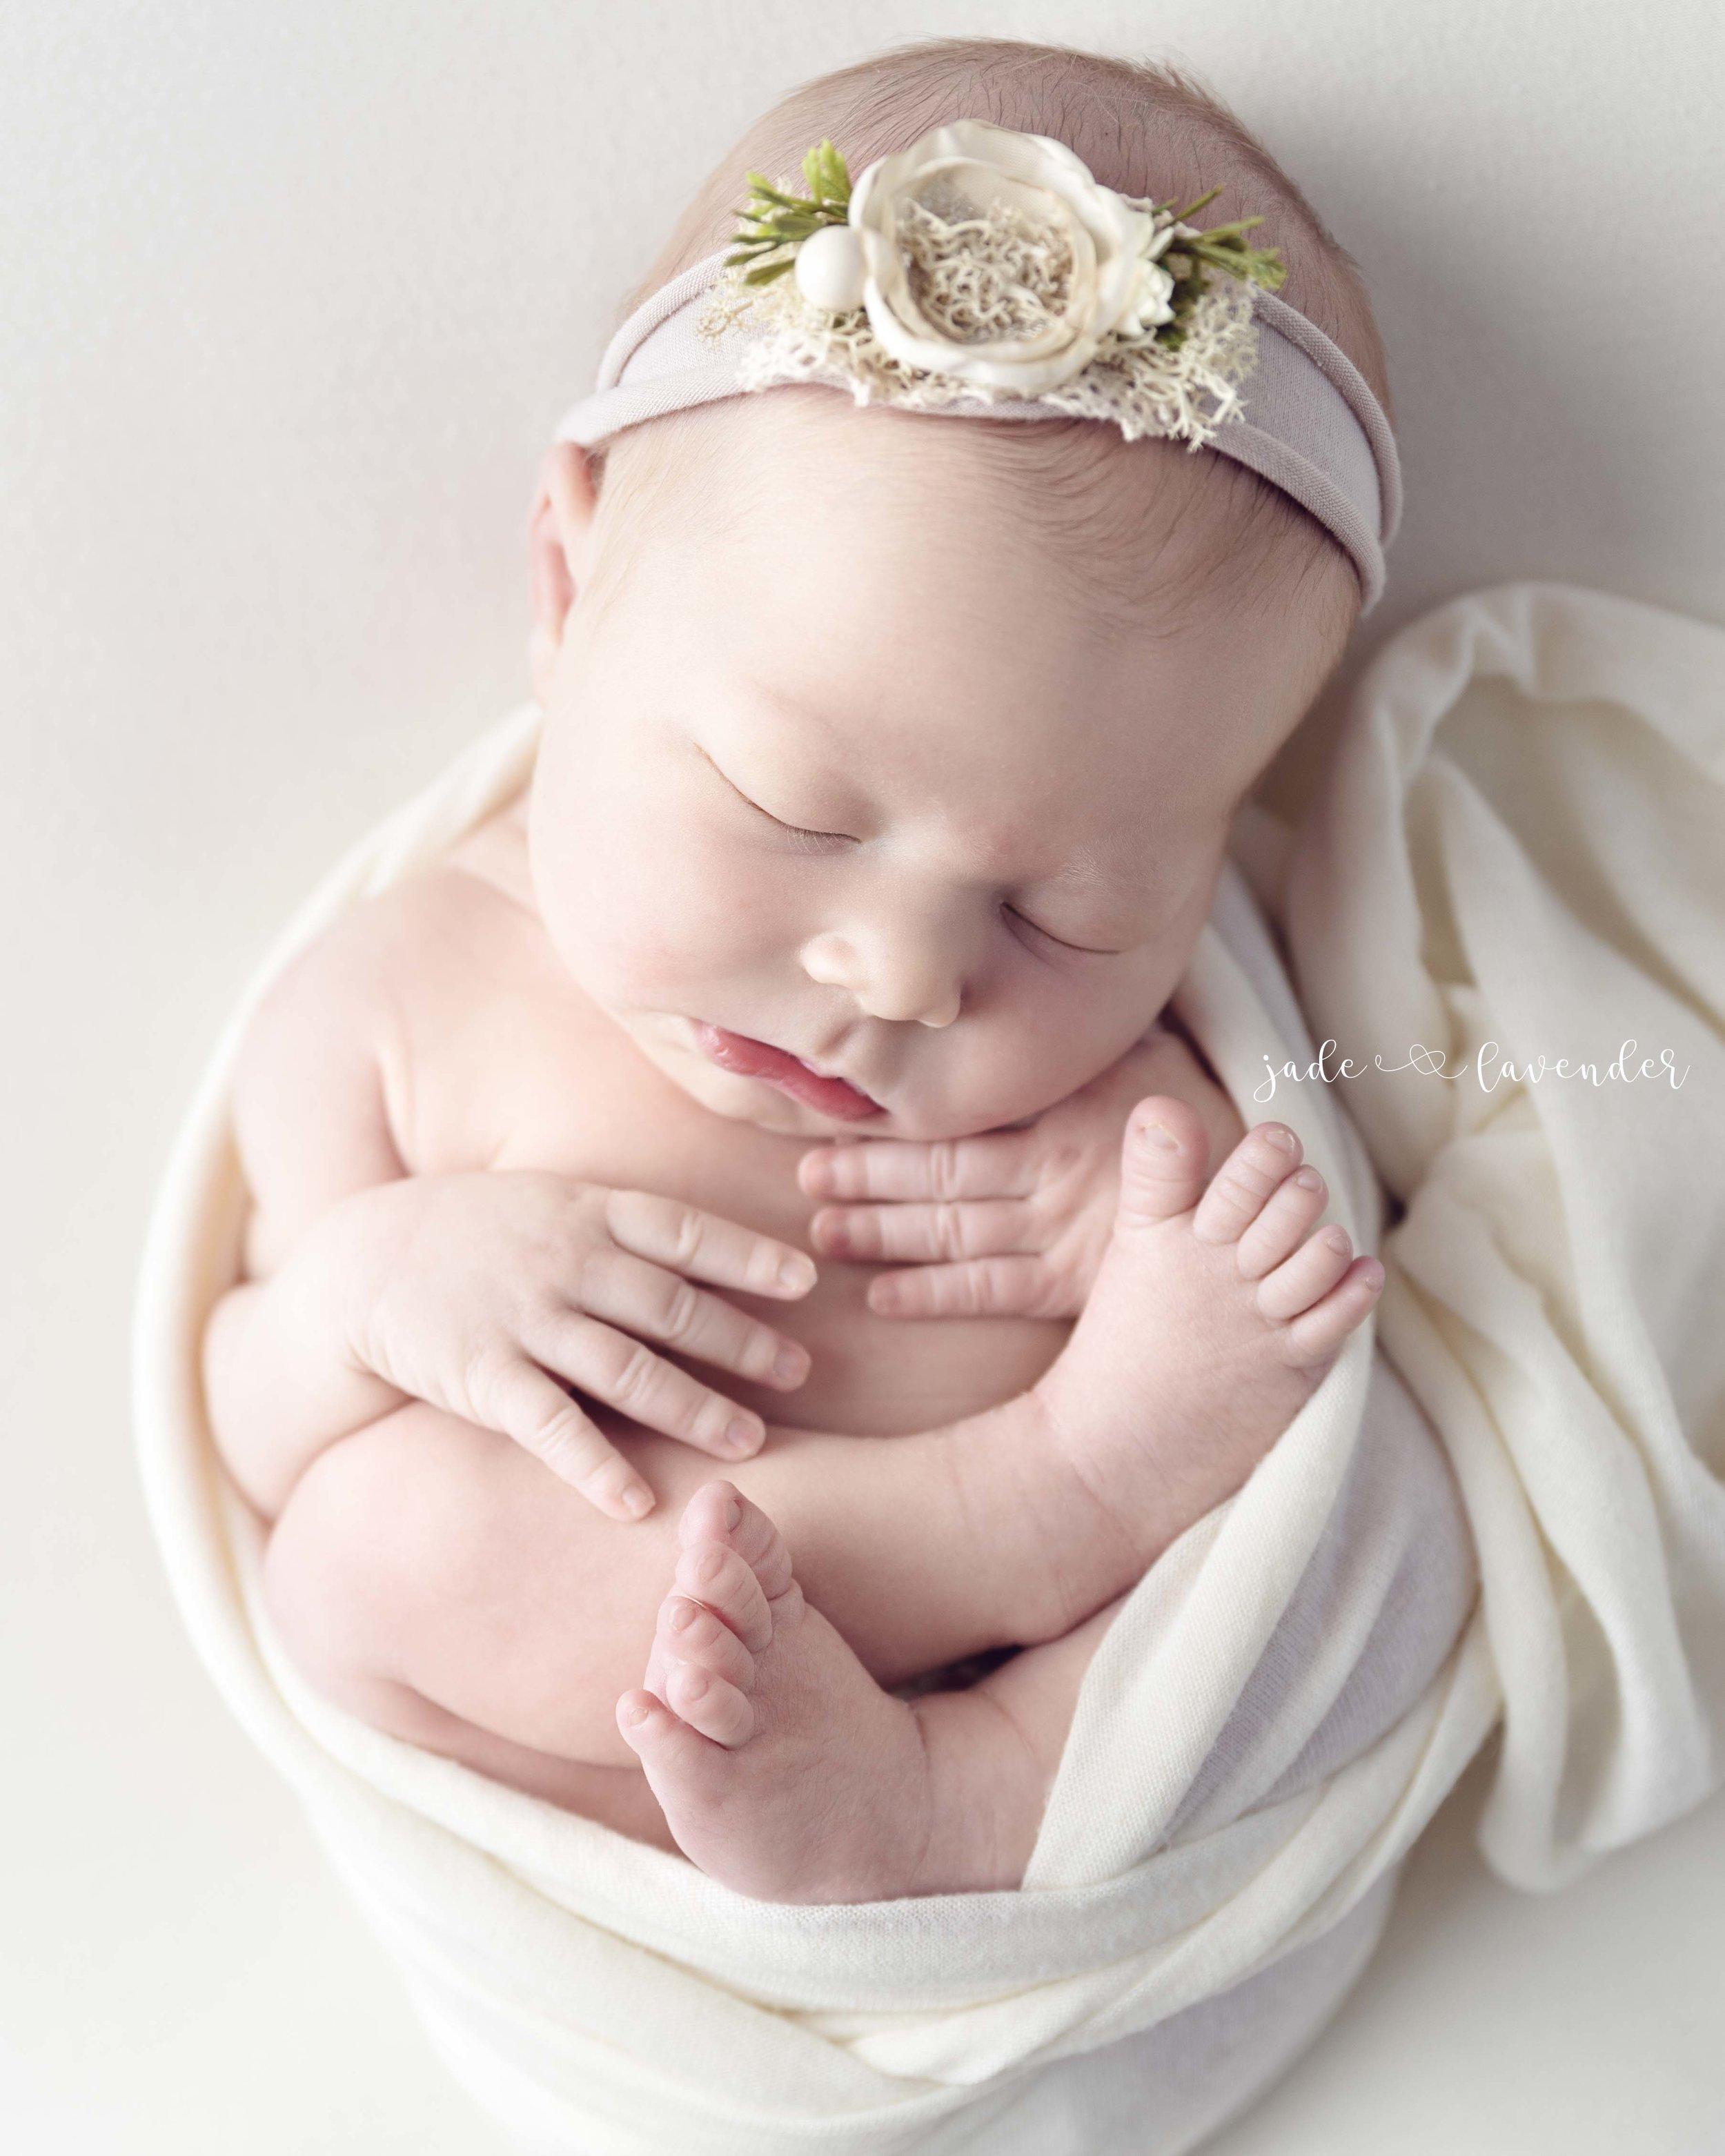 girl-infant-family-photography-baby-photo-studio-newborn-pictures-spokane-washington (1 of 8).jpg